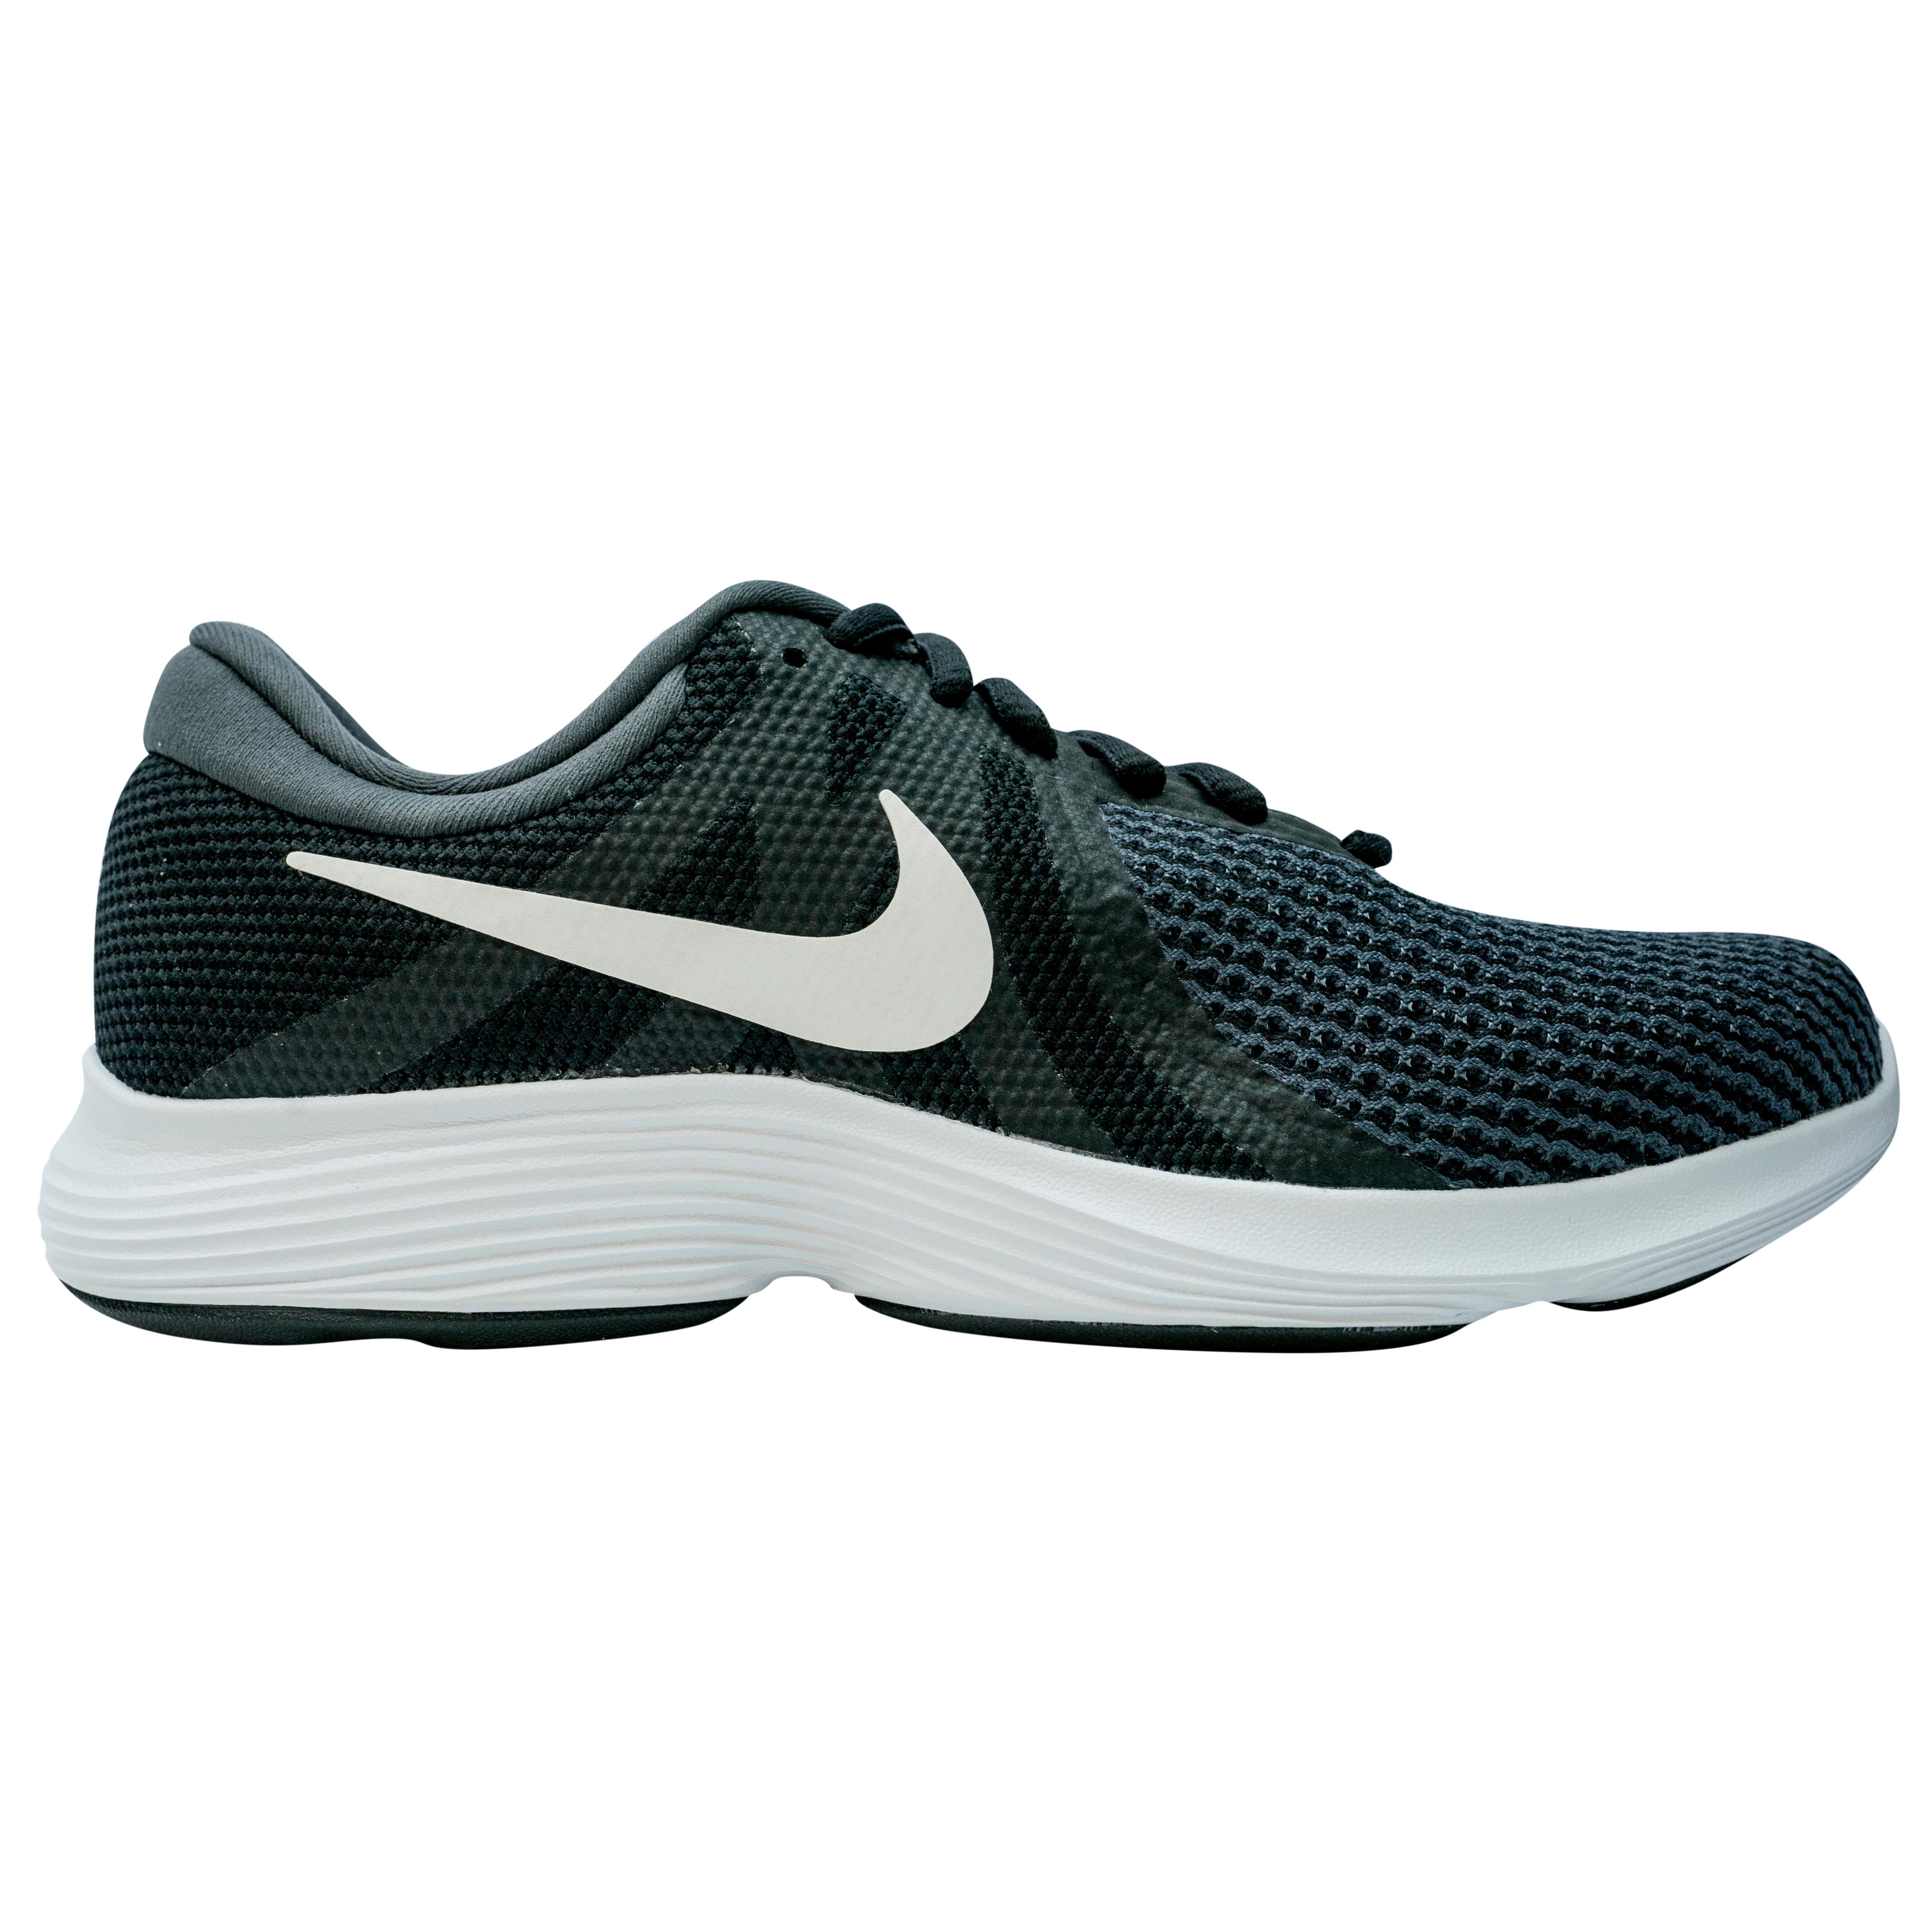 sports shoes 97e2e 59ed2 Zapatillas marcha deportiva para mujer Revolution 4 negro   blanco Nike    Decathlon